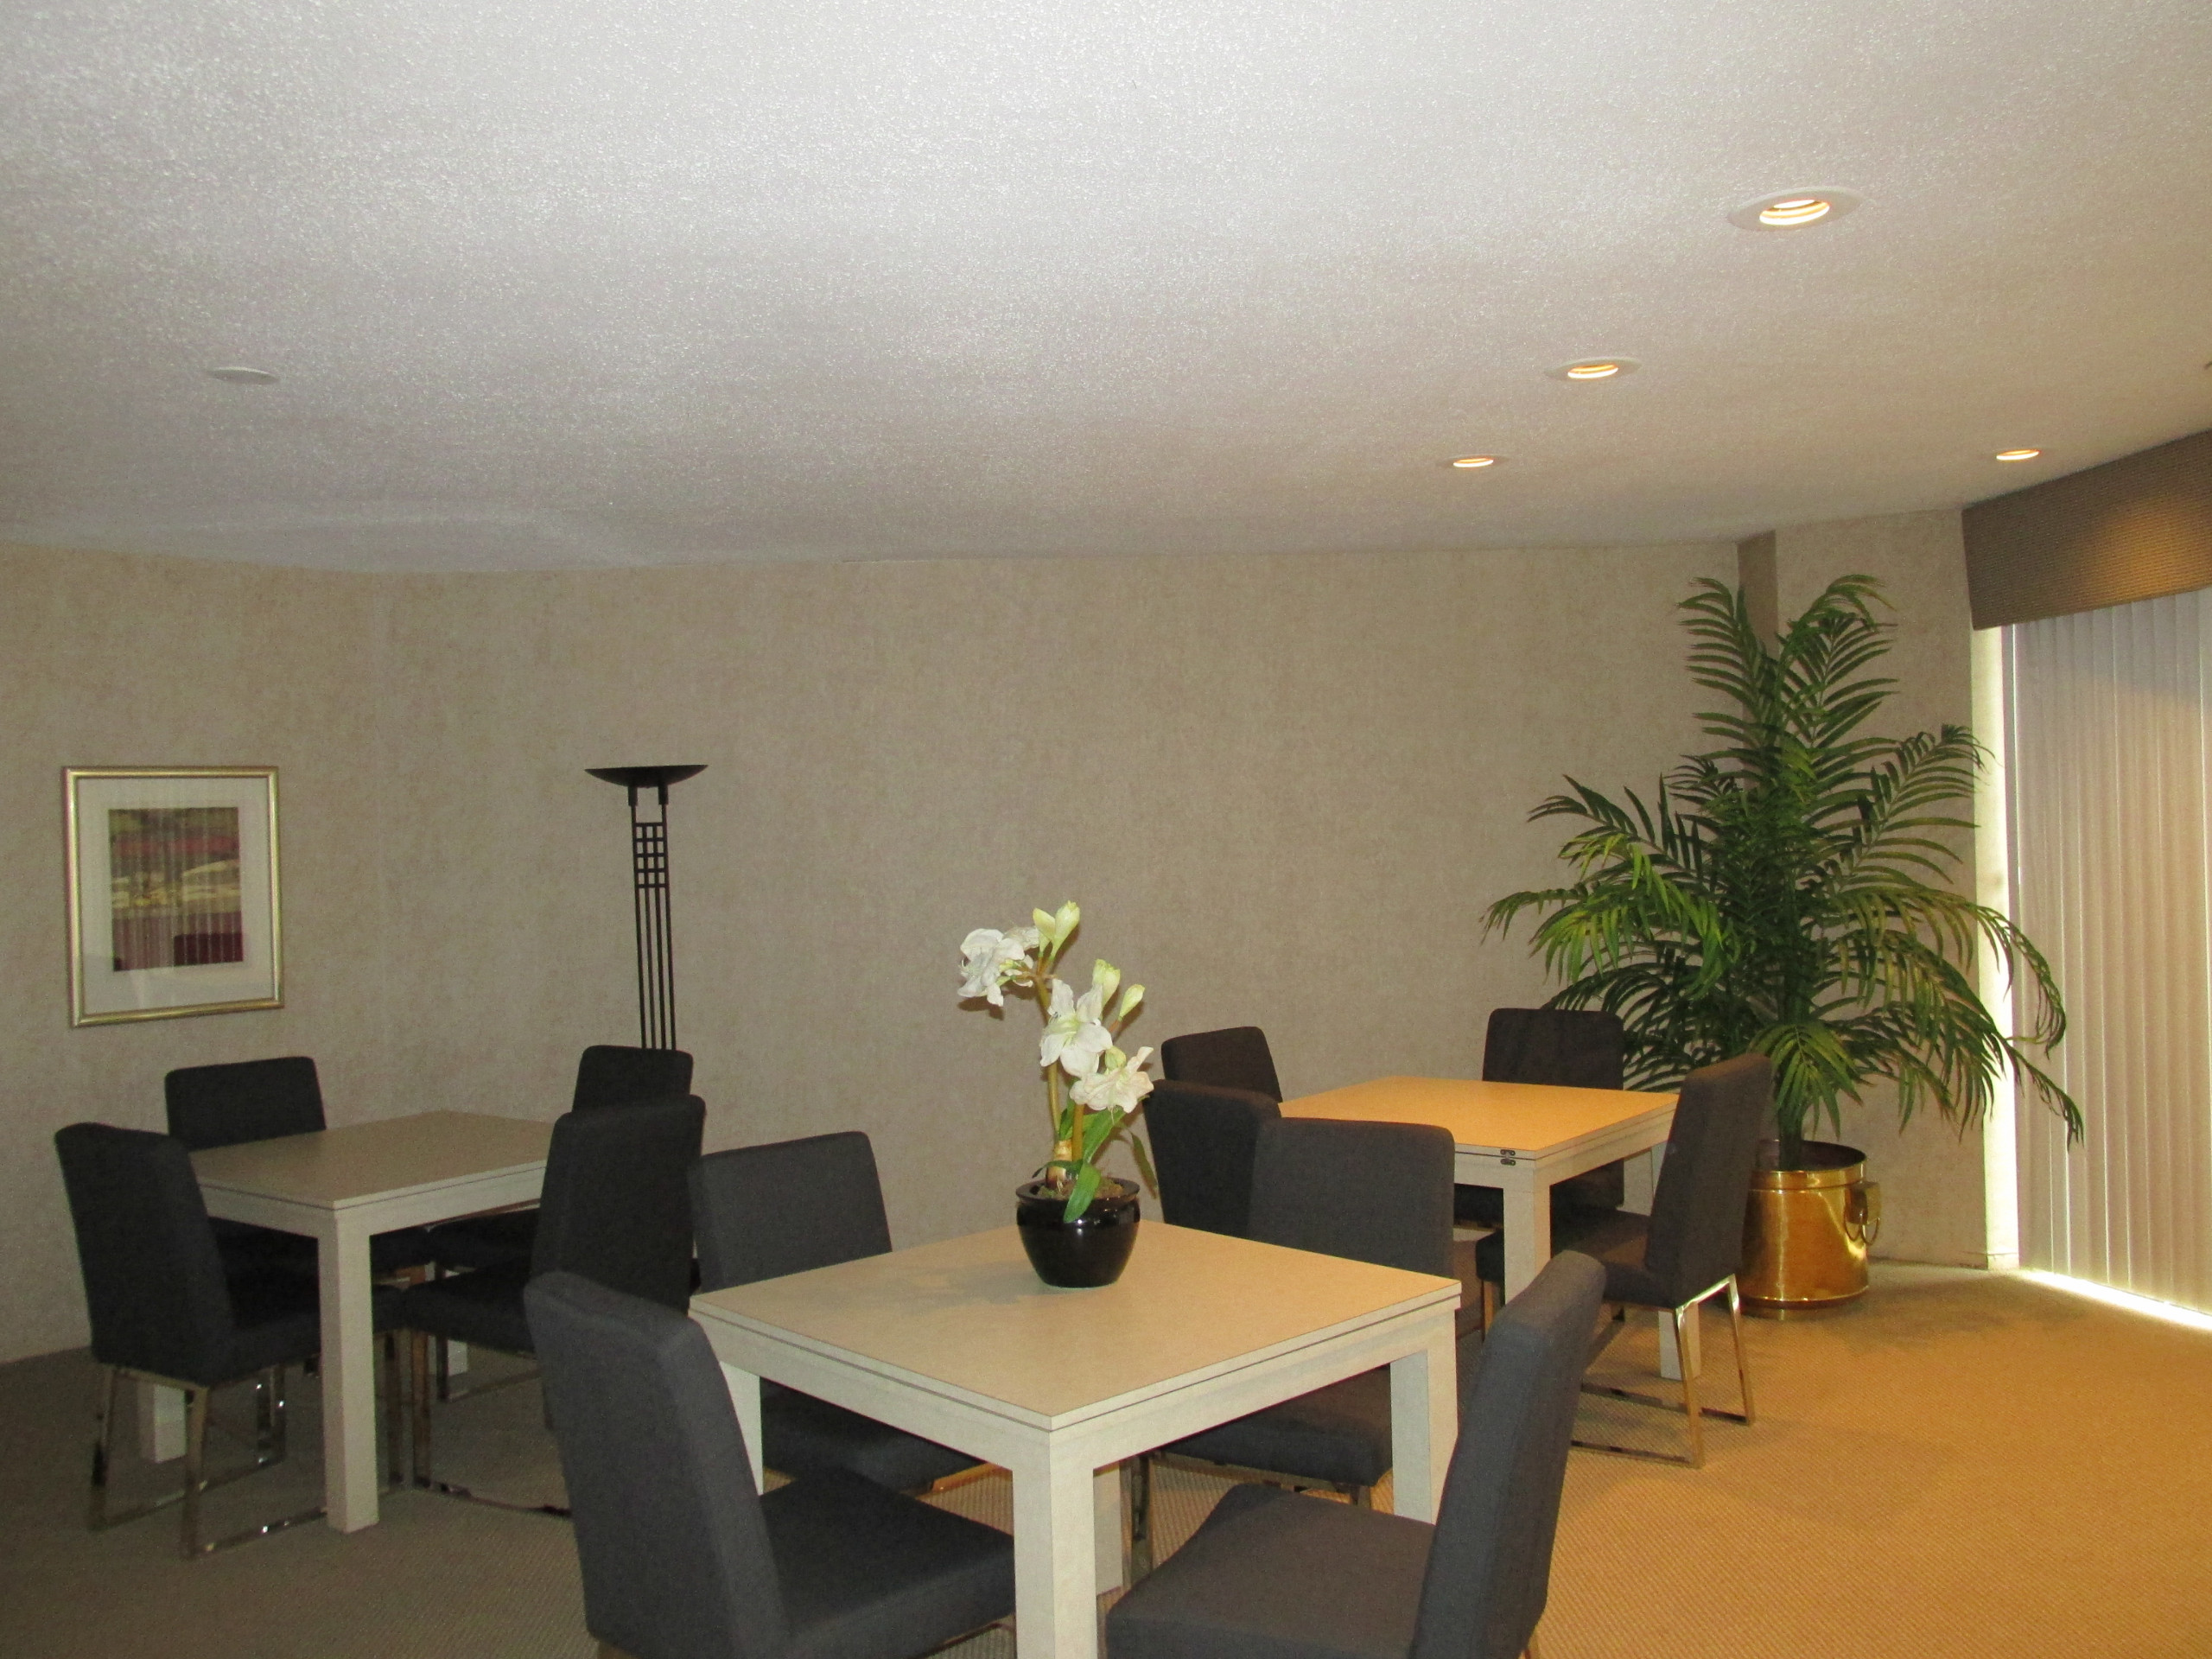 Condo Hospitality Suite